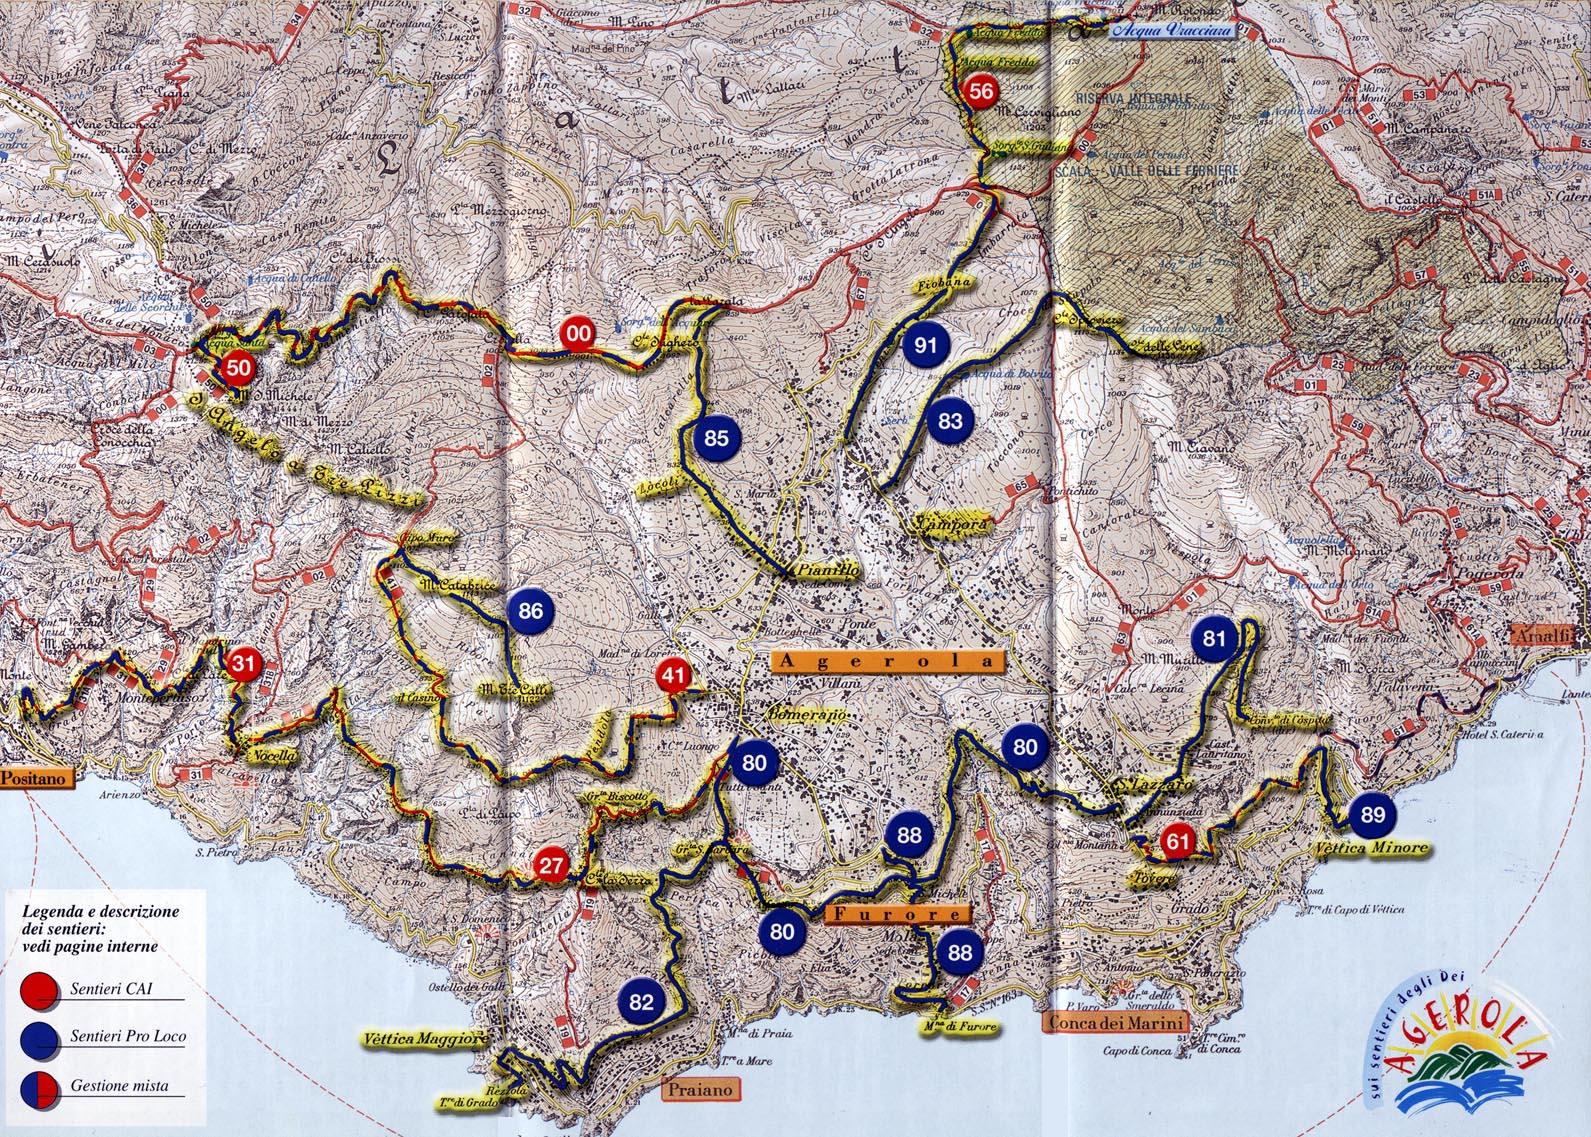 Amalfi Coast Online Travel Guide Amalfi Coast Hiking Maps